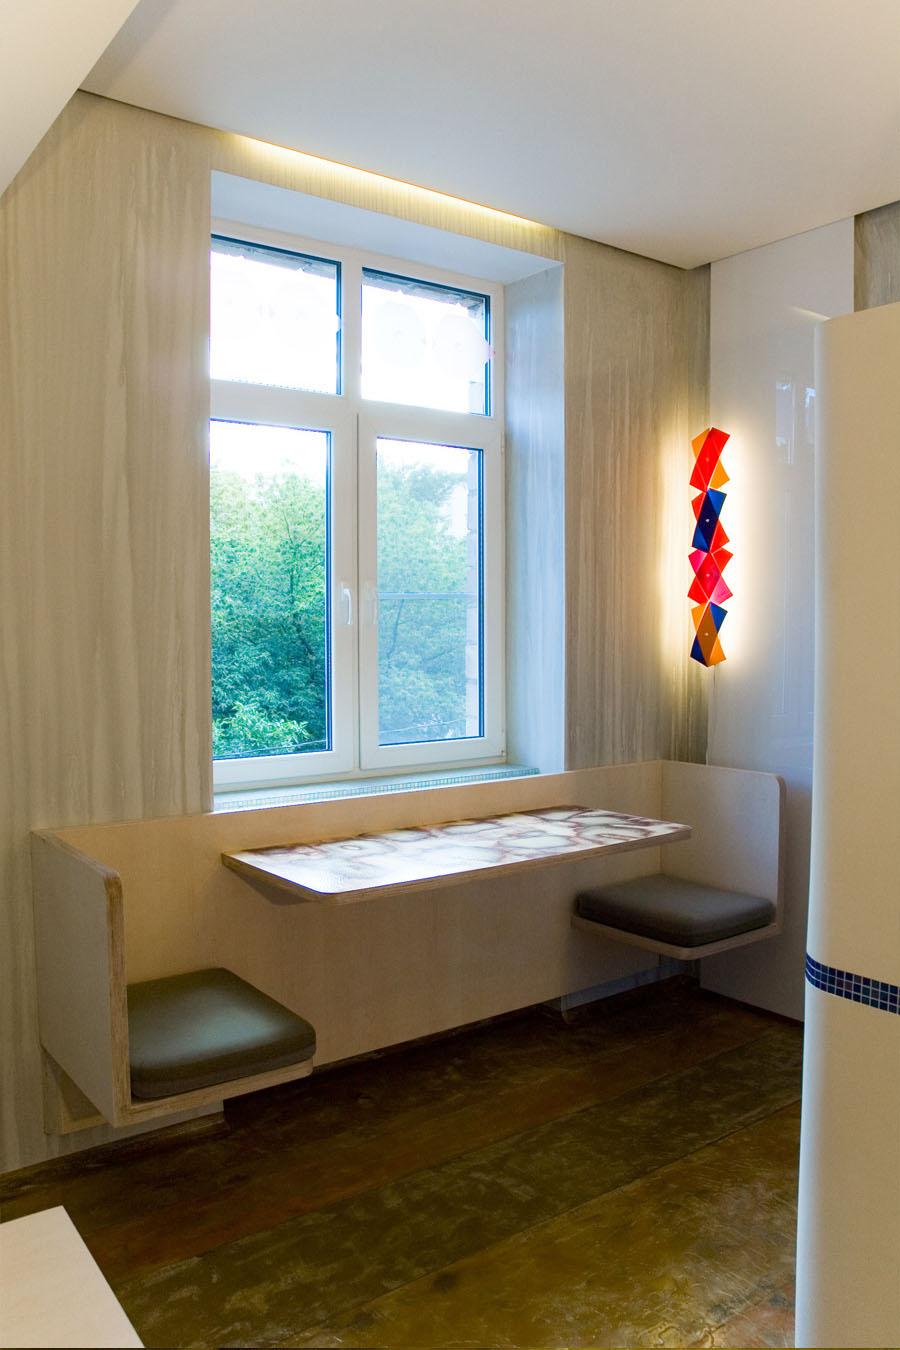 Freydenberg_Apartment_Hotel_34.jpg